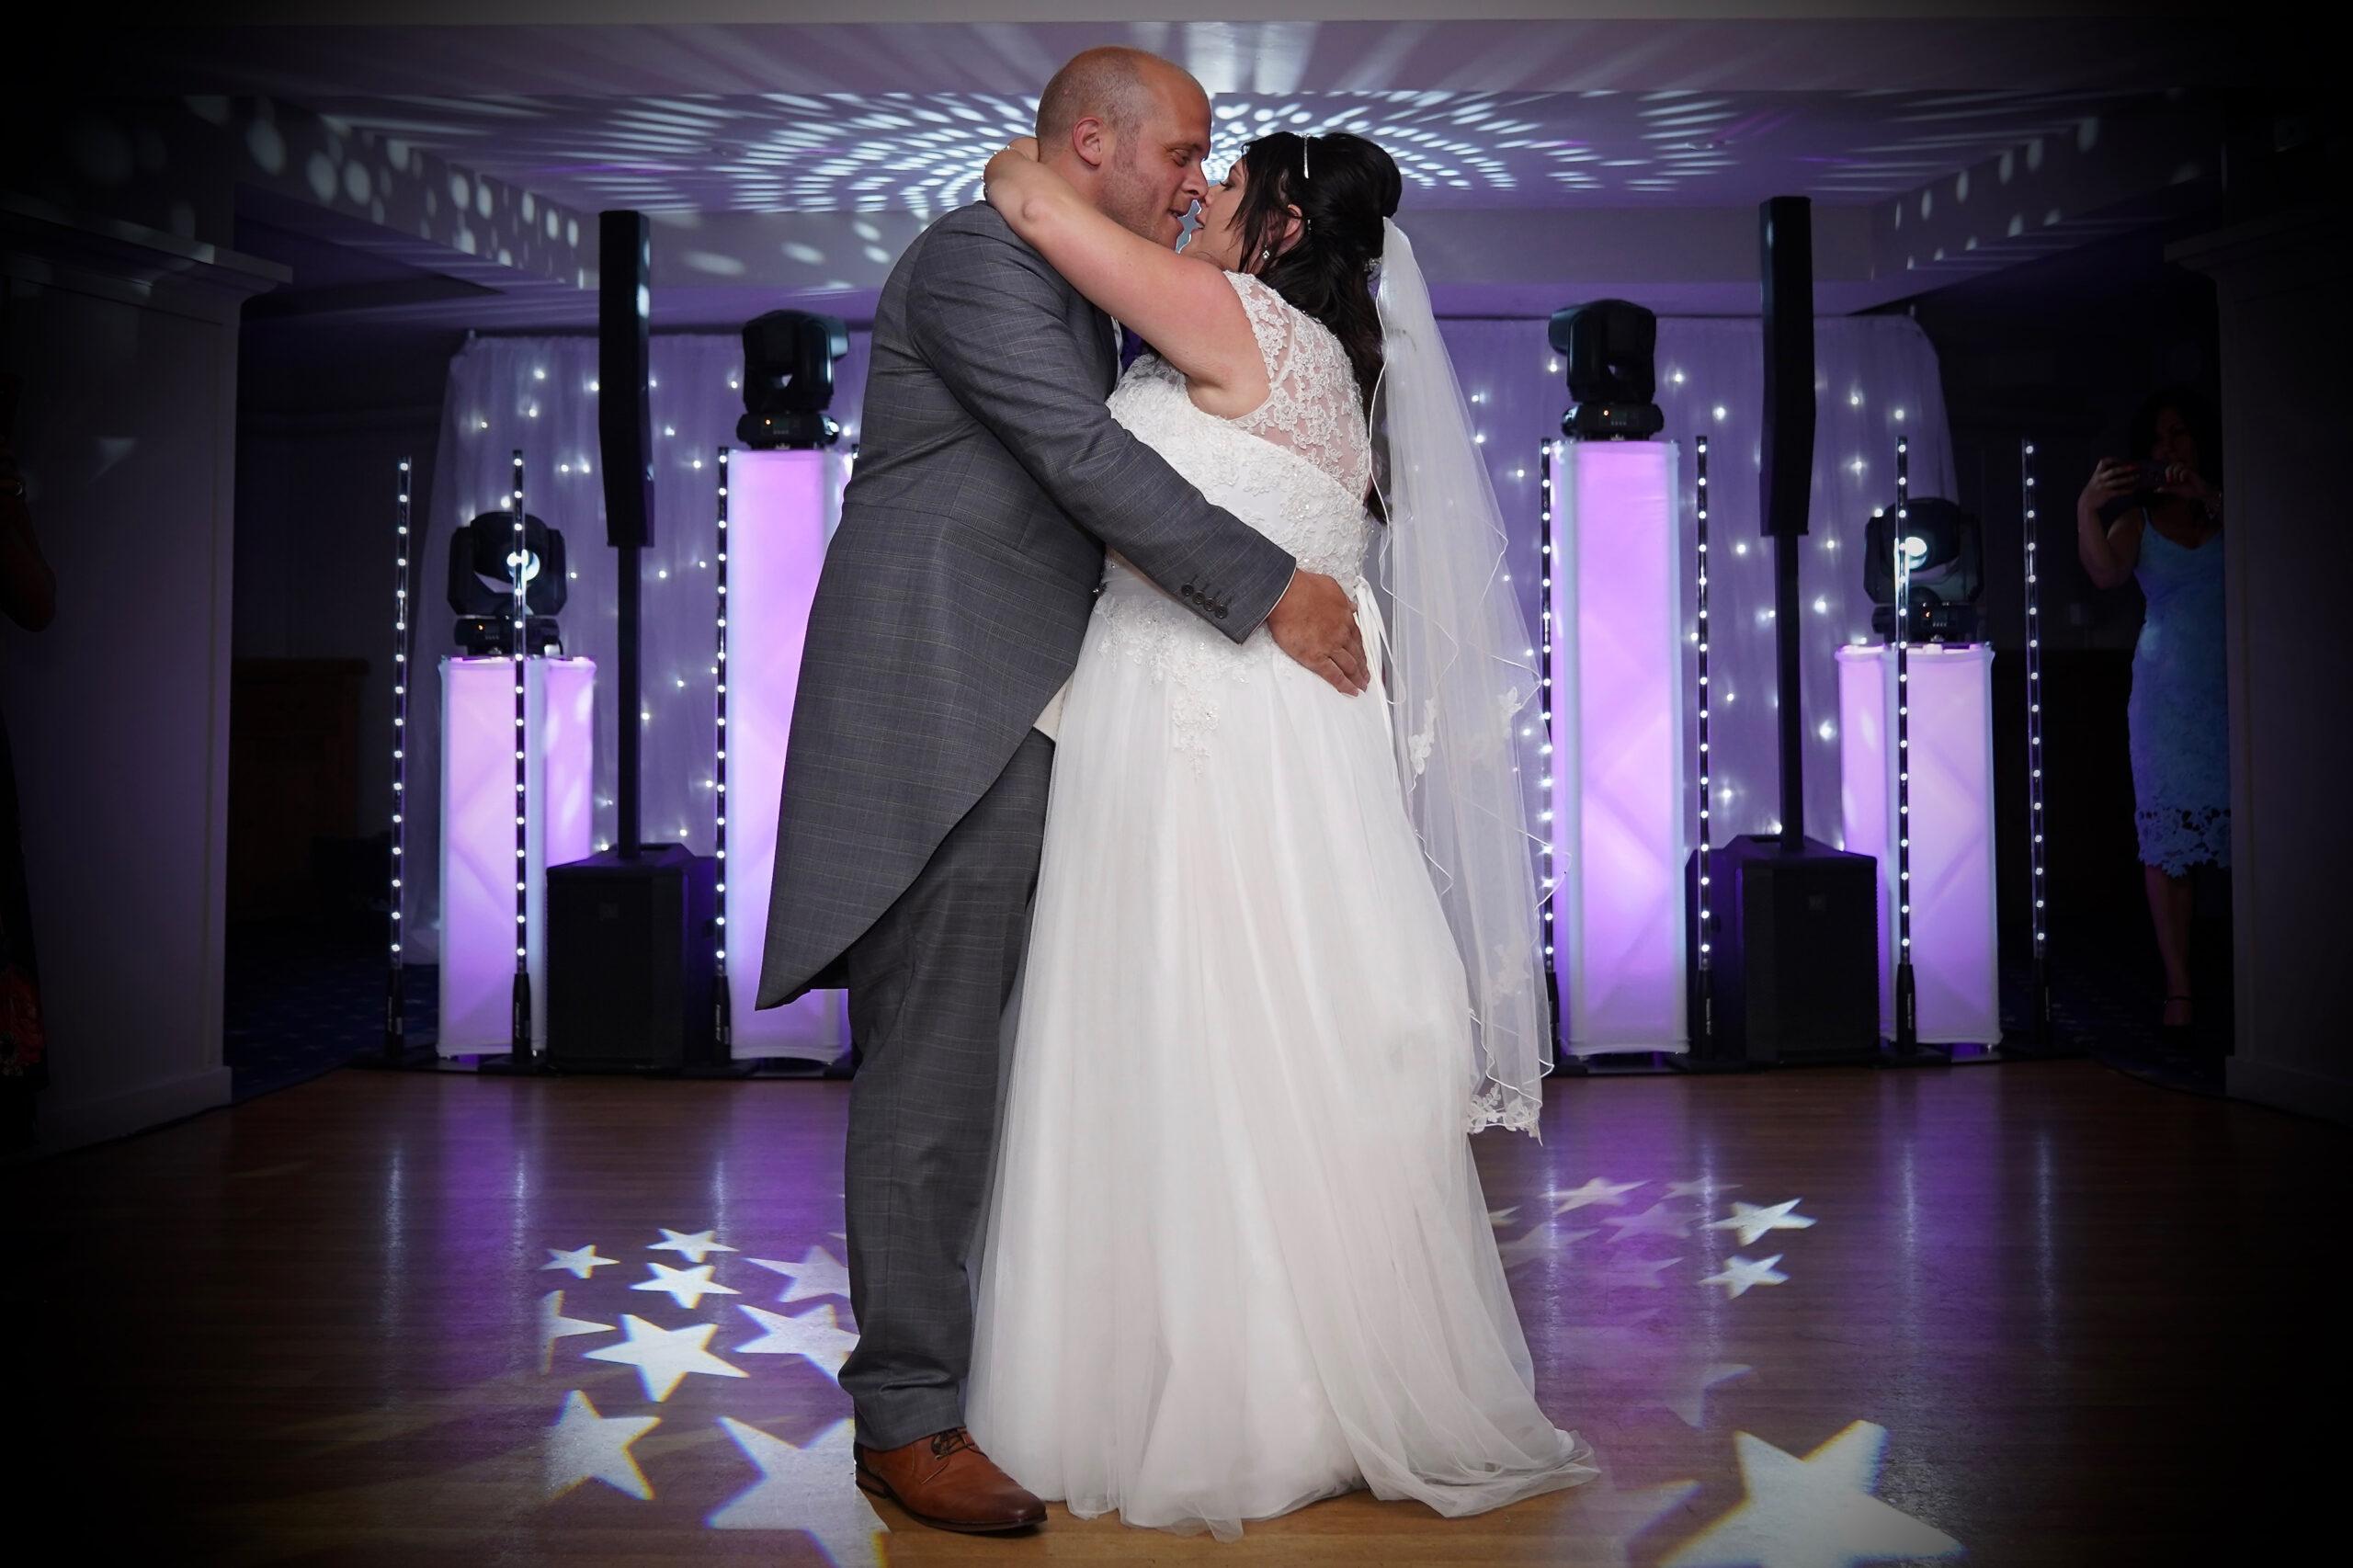 Wedding Reception First Dance, Cooden Beach Hotel, Bexhill